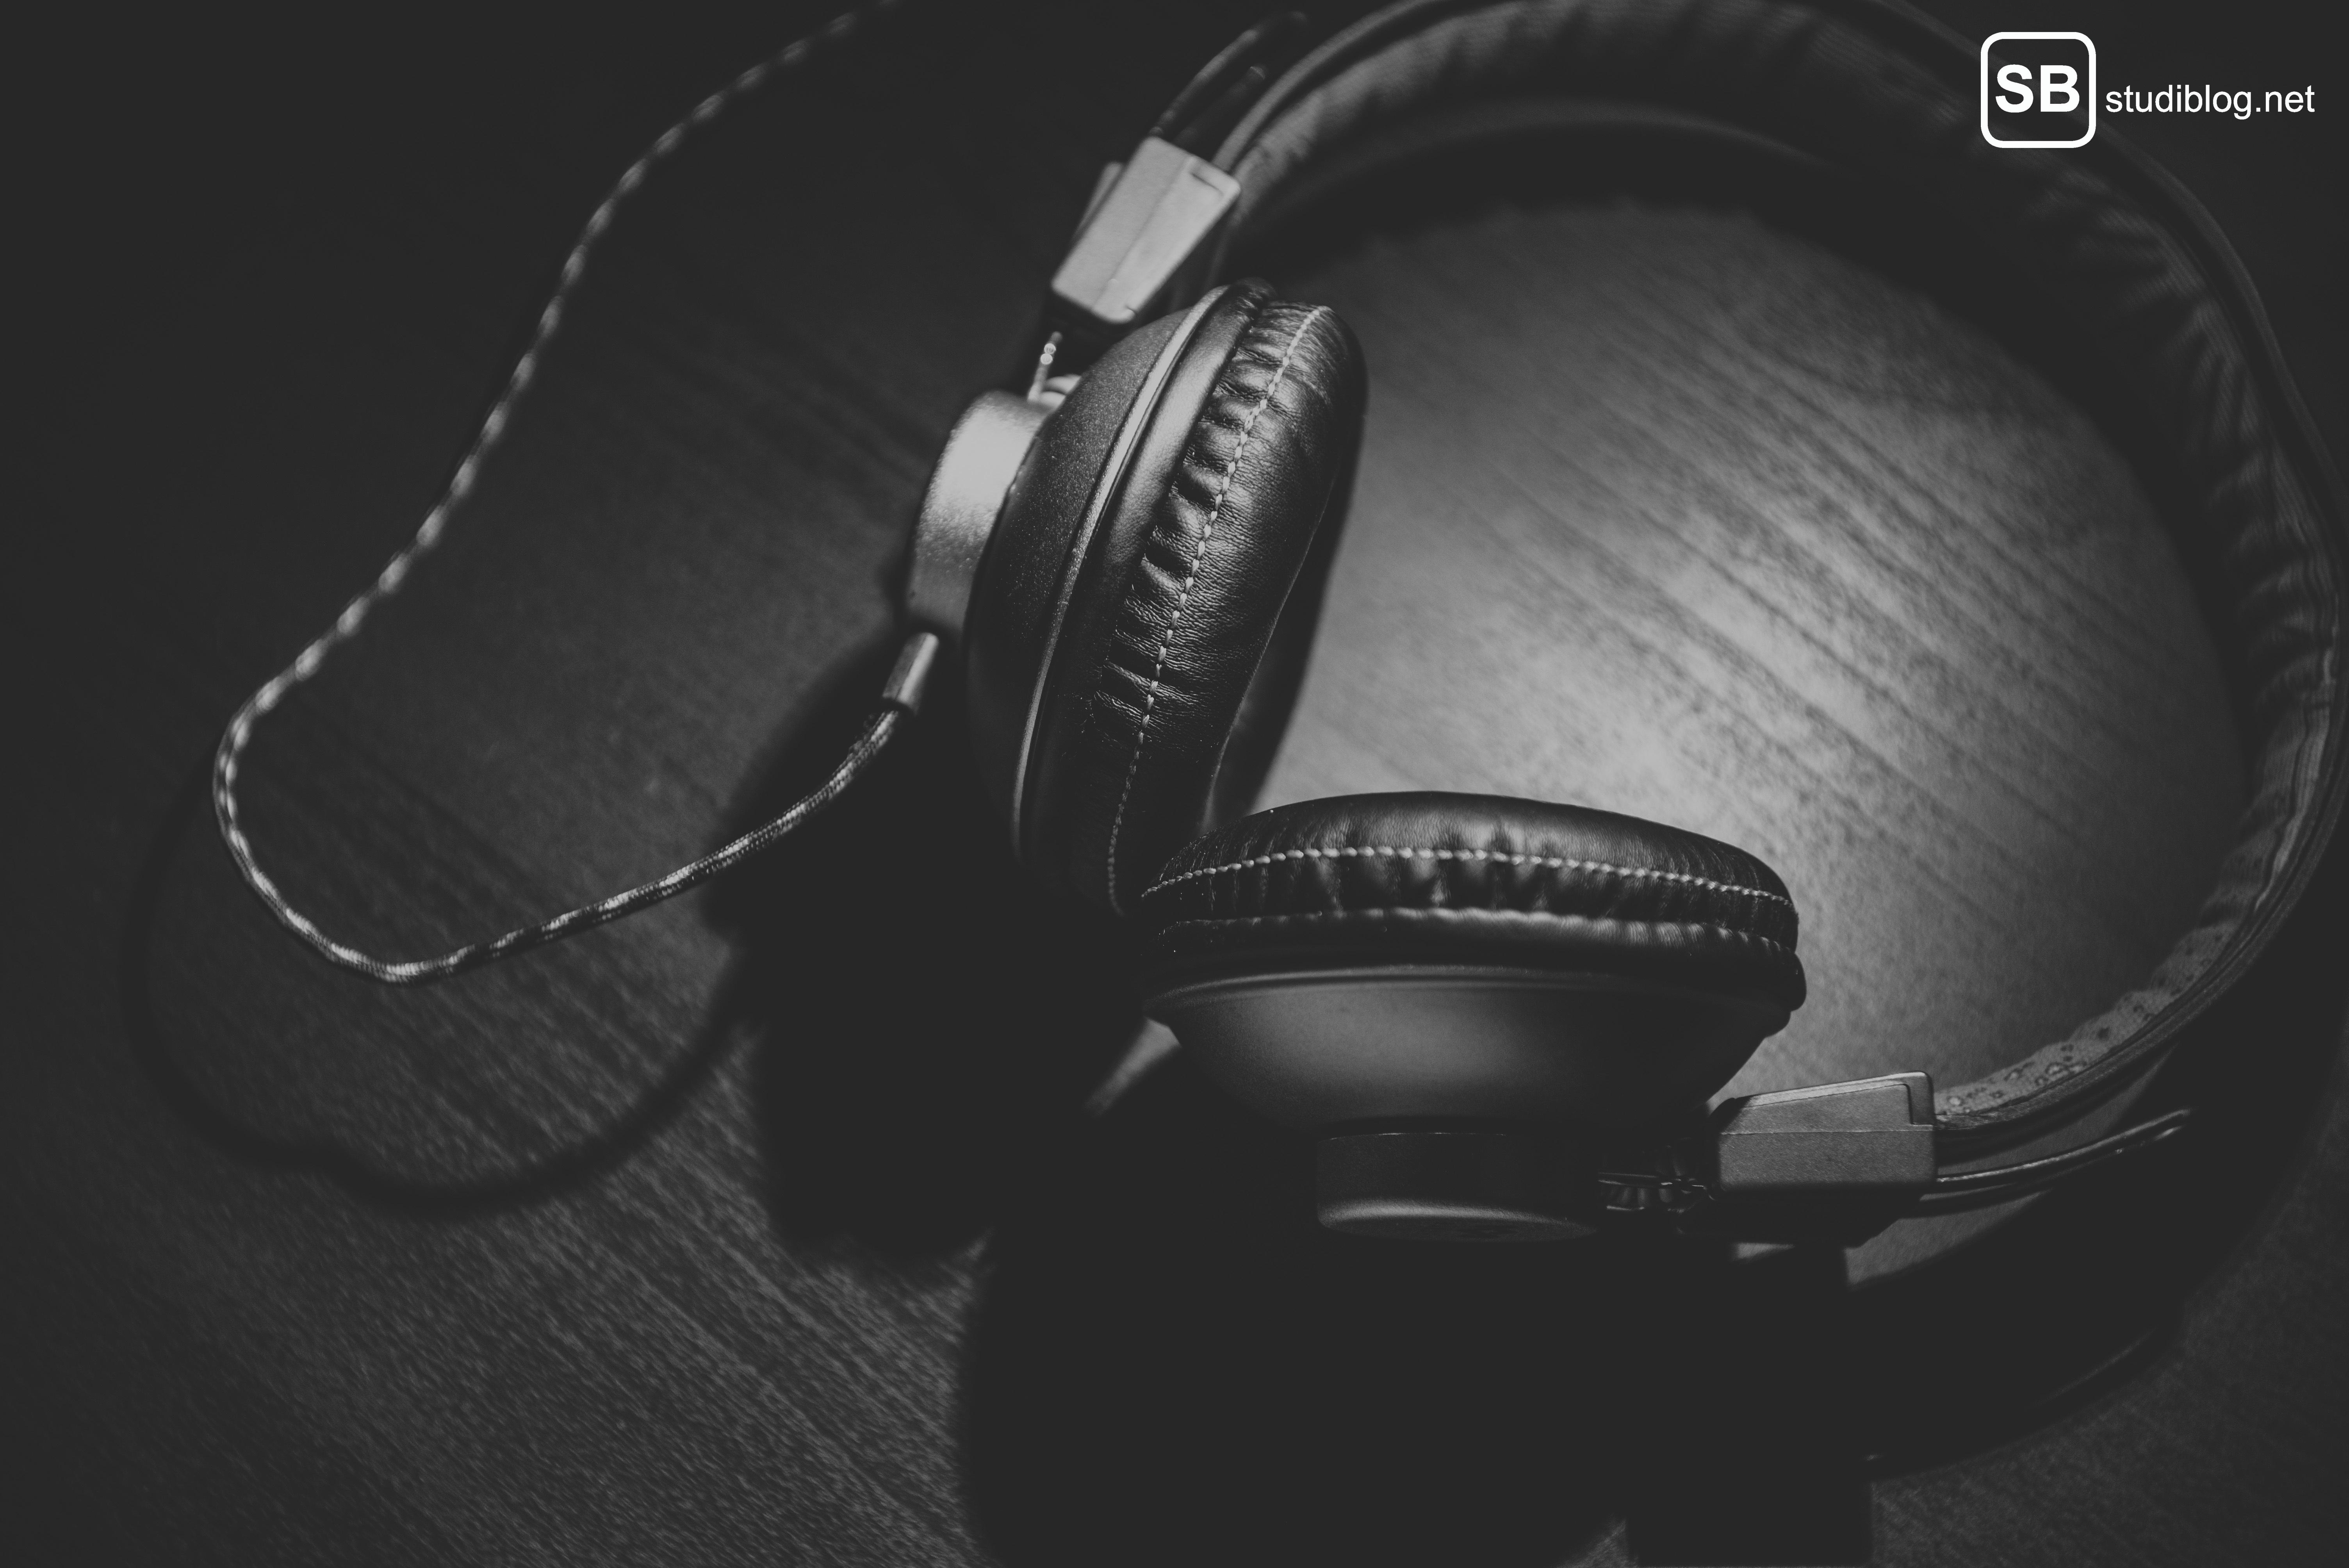 Musik: Kopfhörer liegen auf Holz